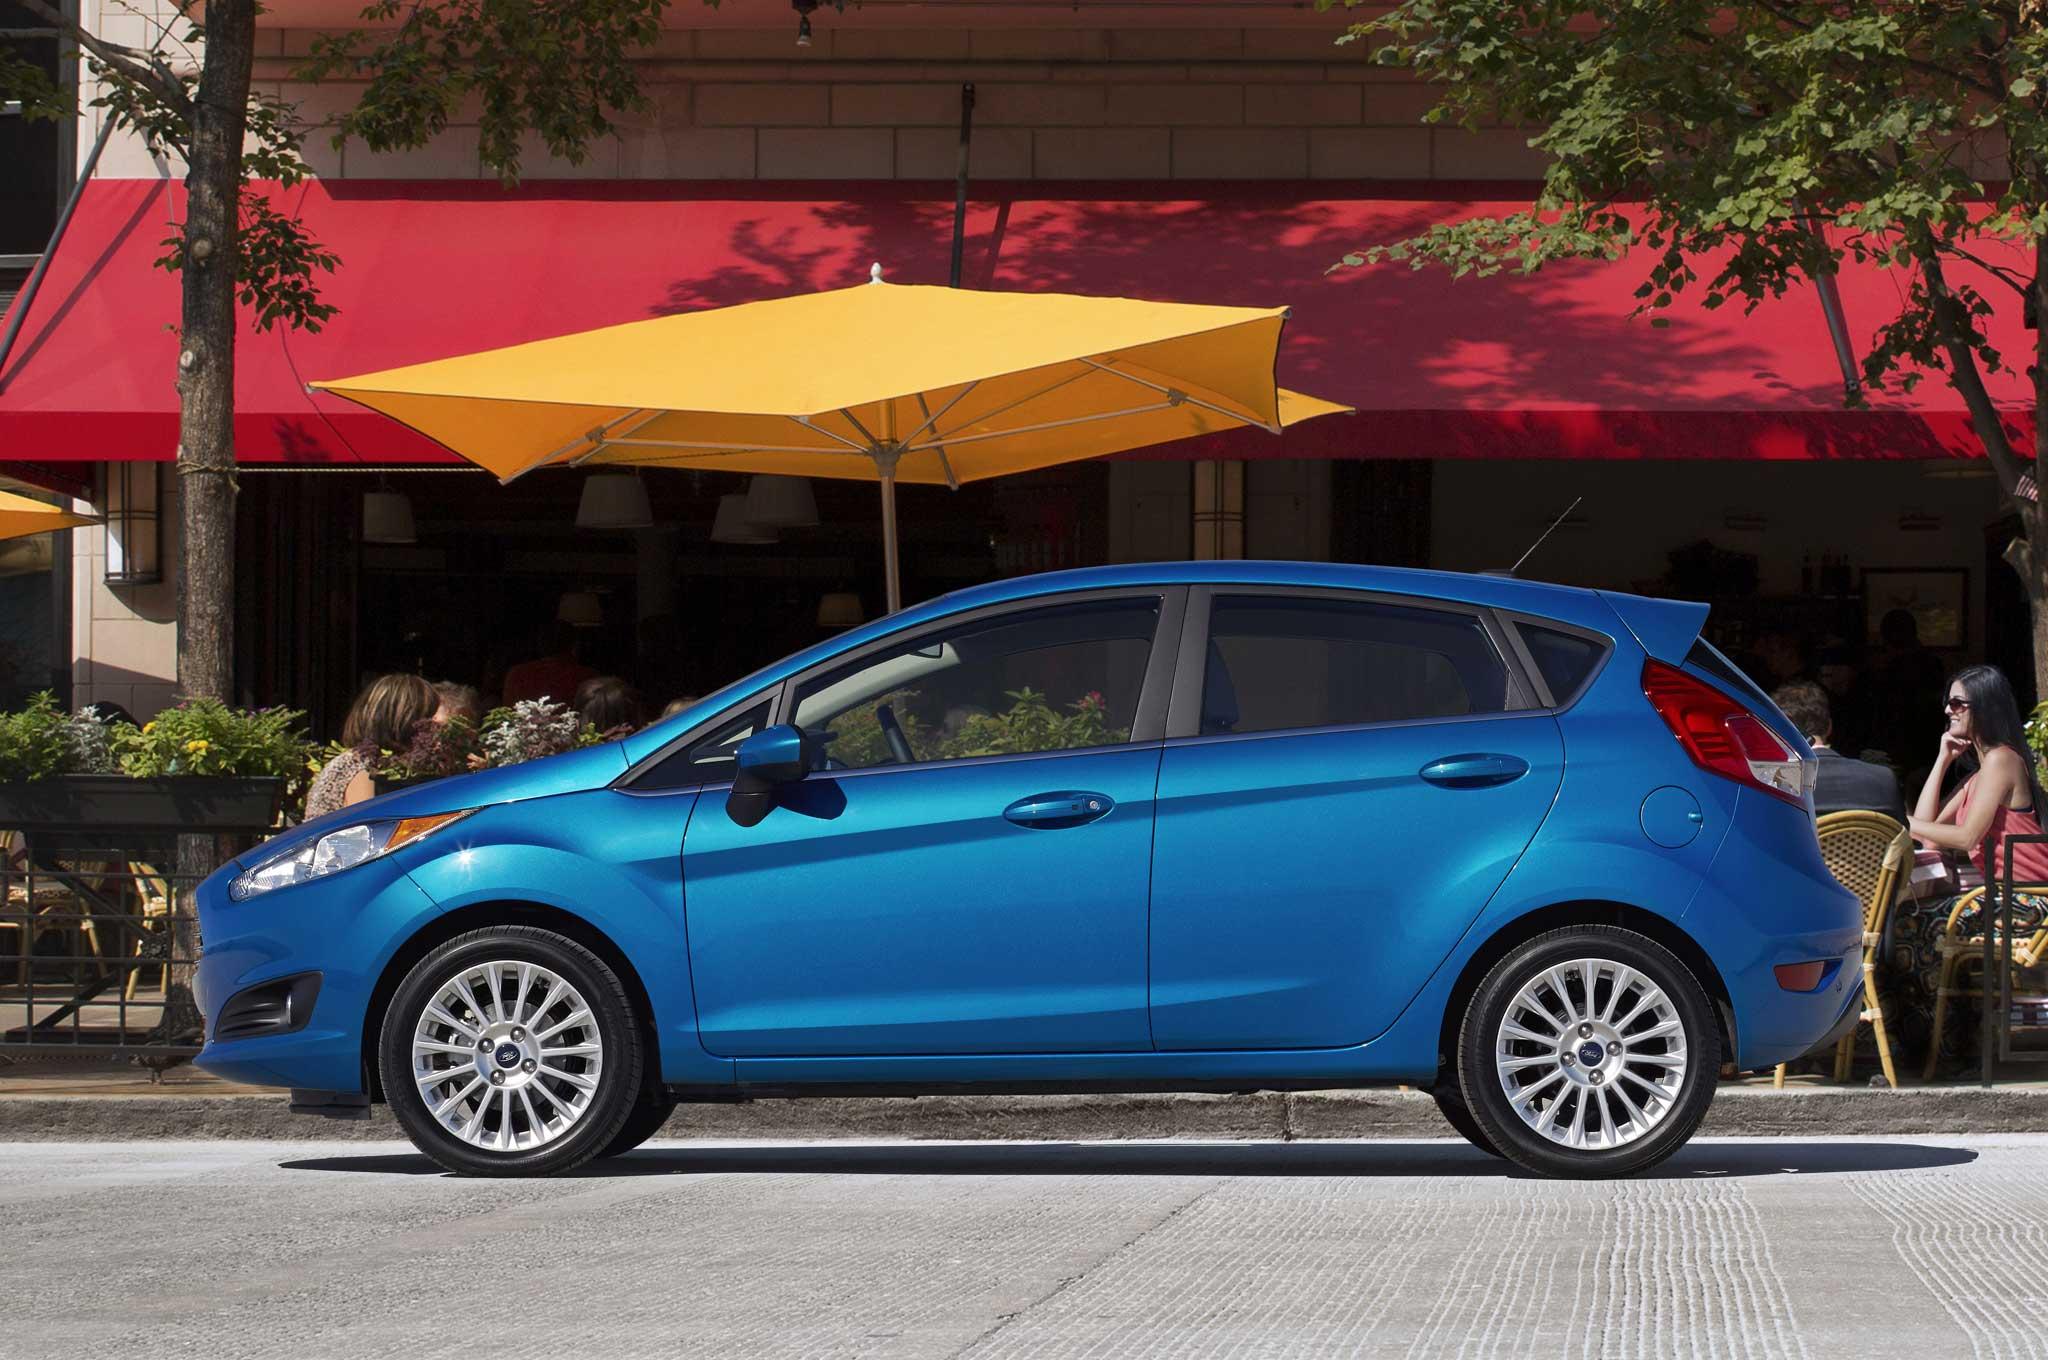 2014 Ford Fiesta Hatchback Profile1